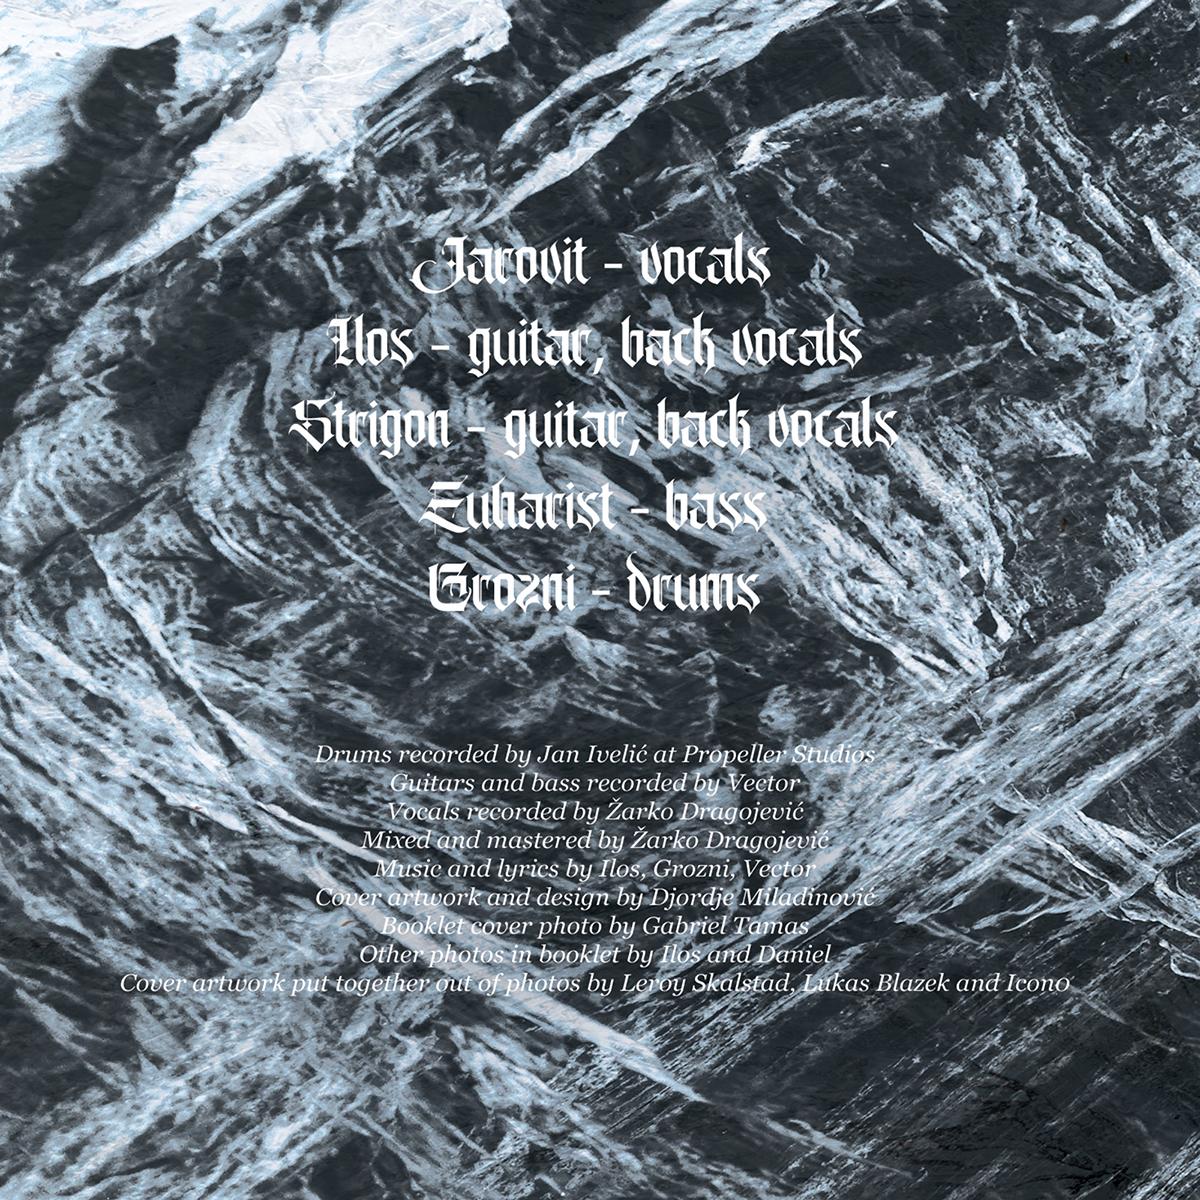 ZIMOGROZ - Old Mystic Lore